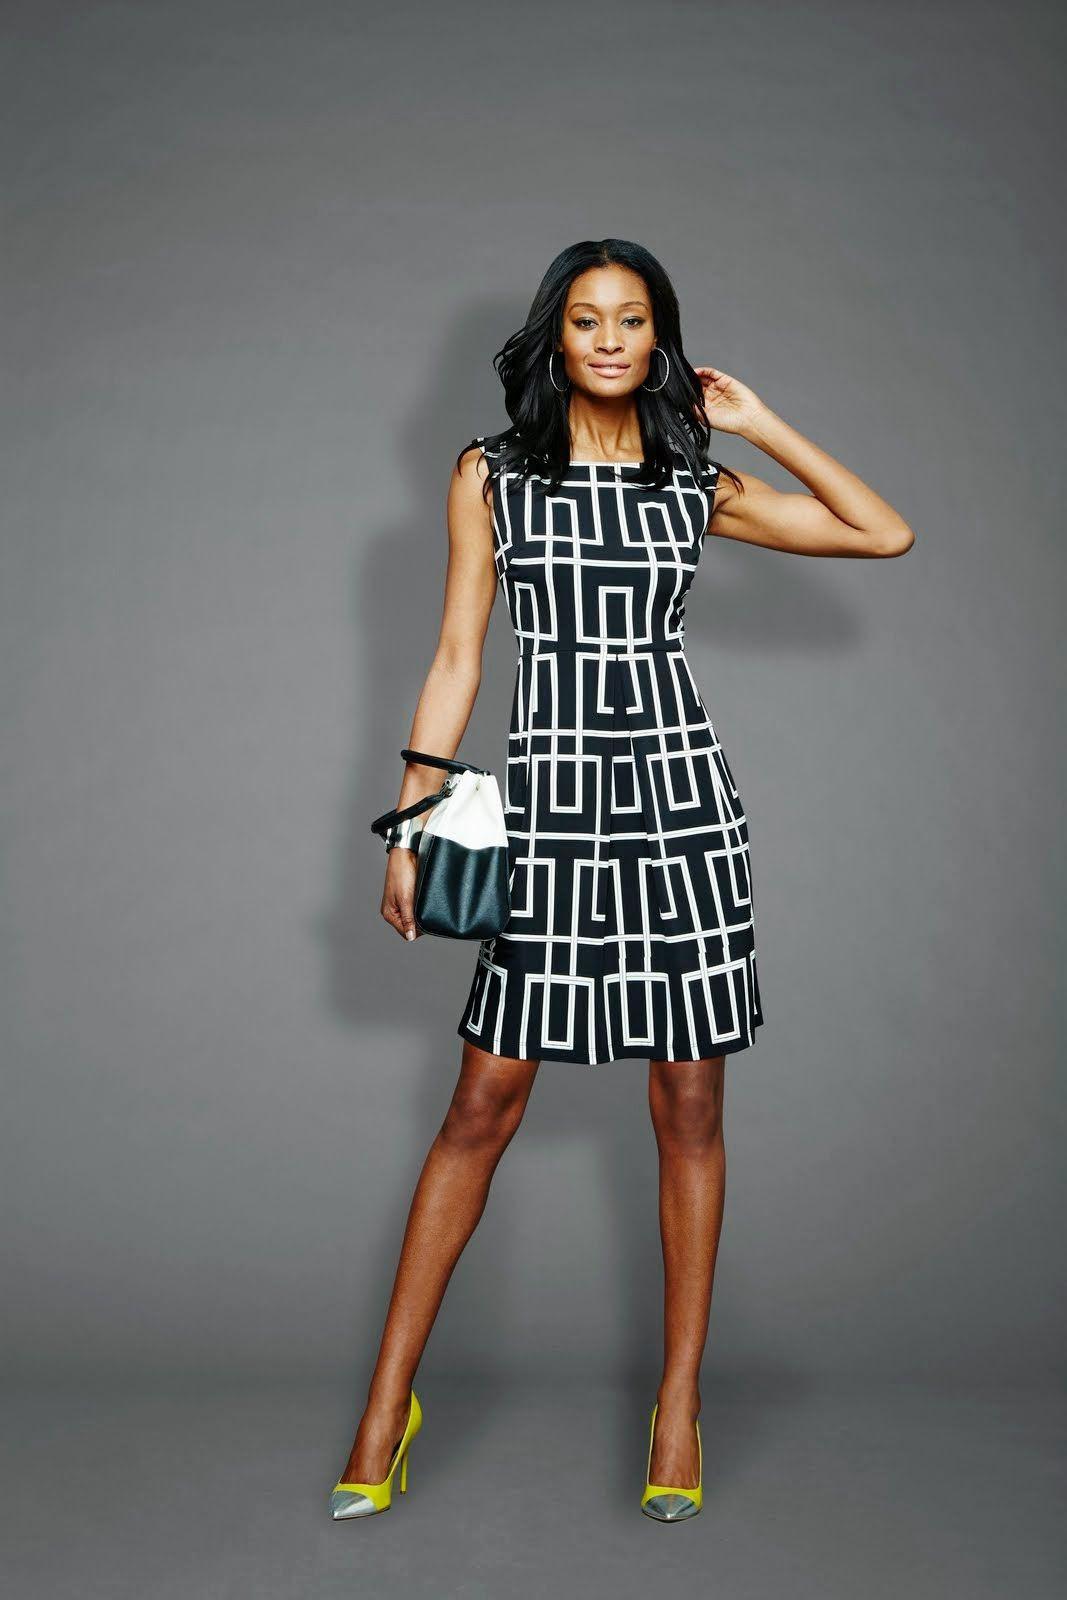 Retro style fashion model, Photo shoot